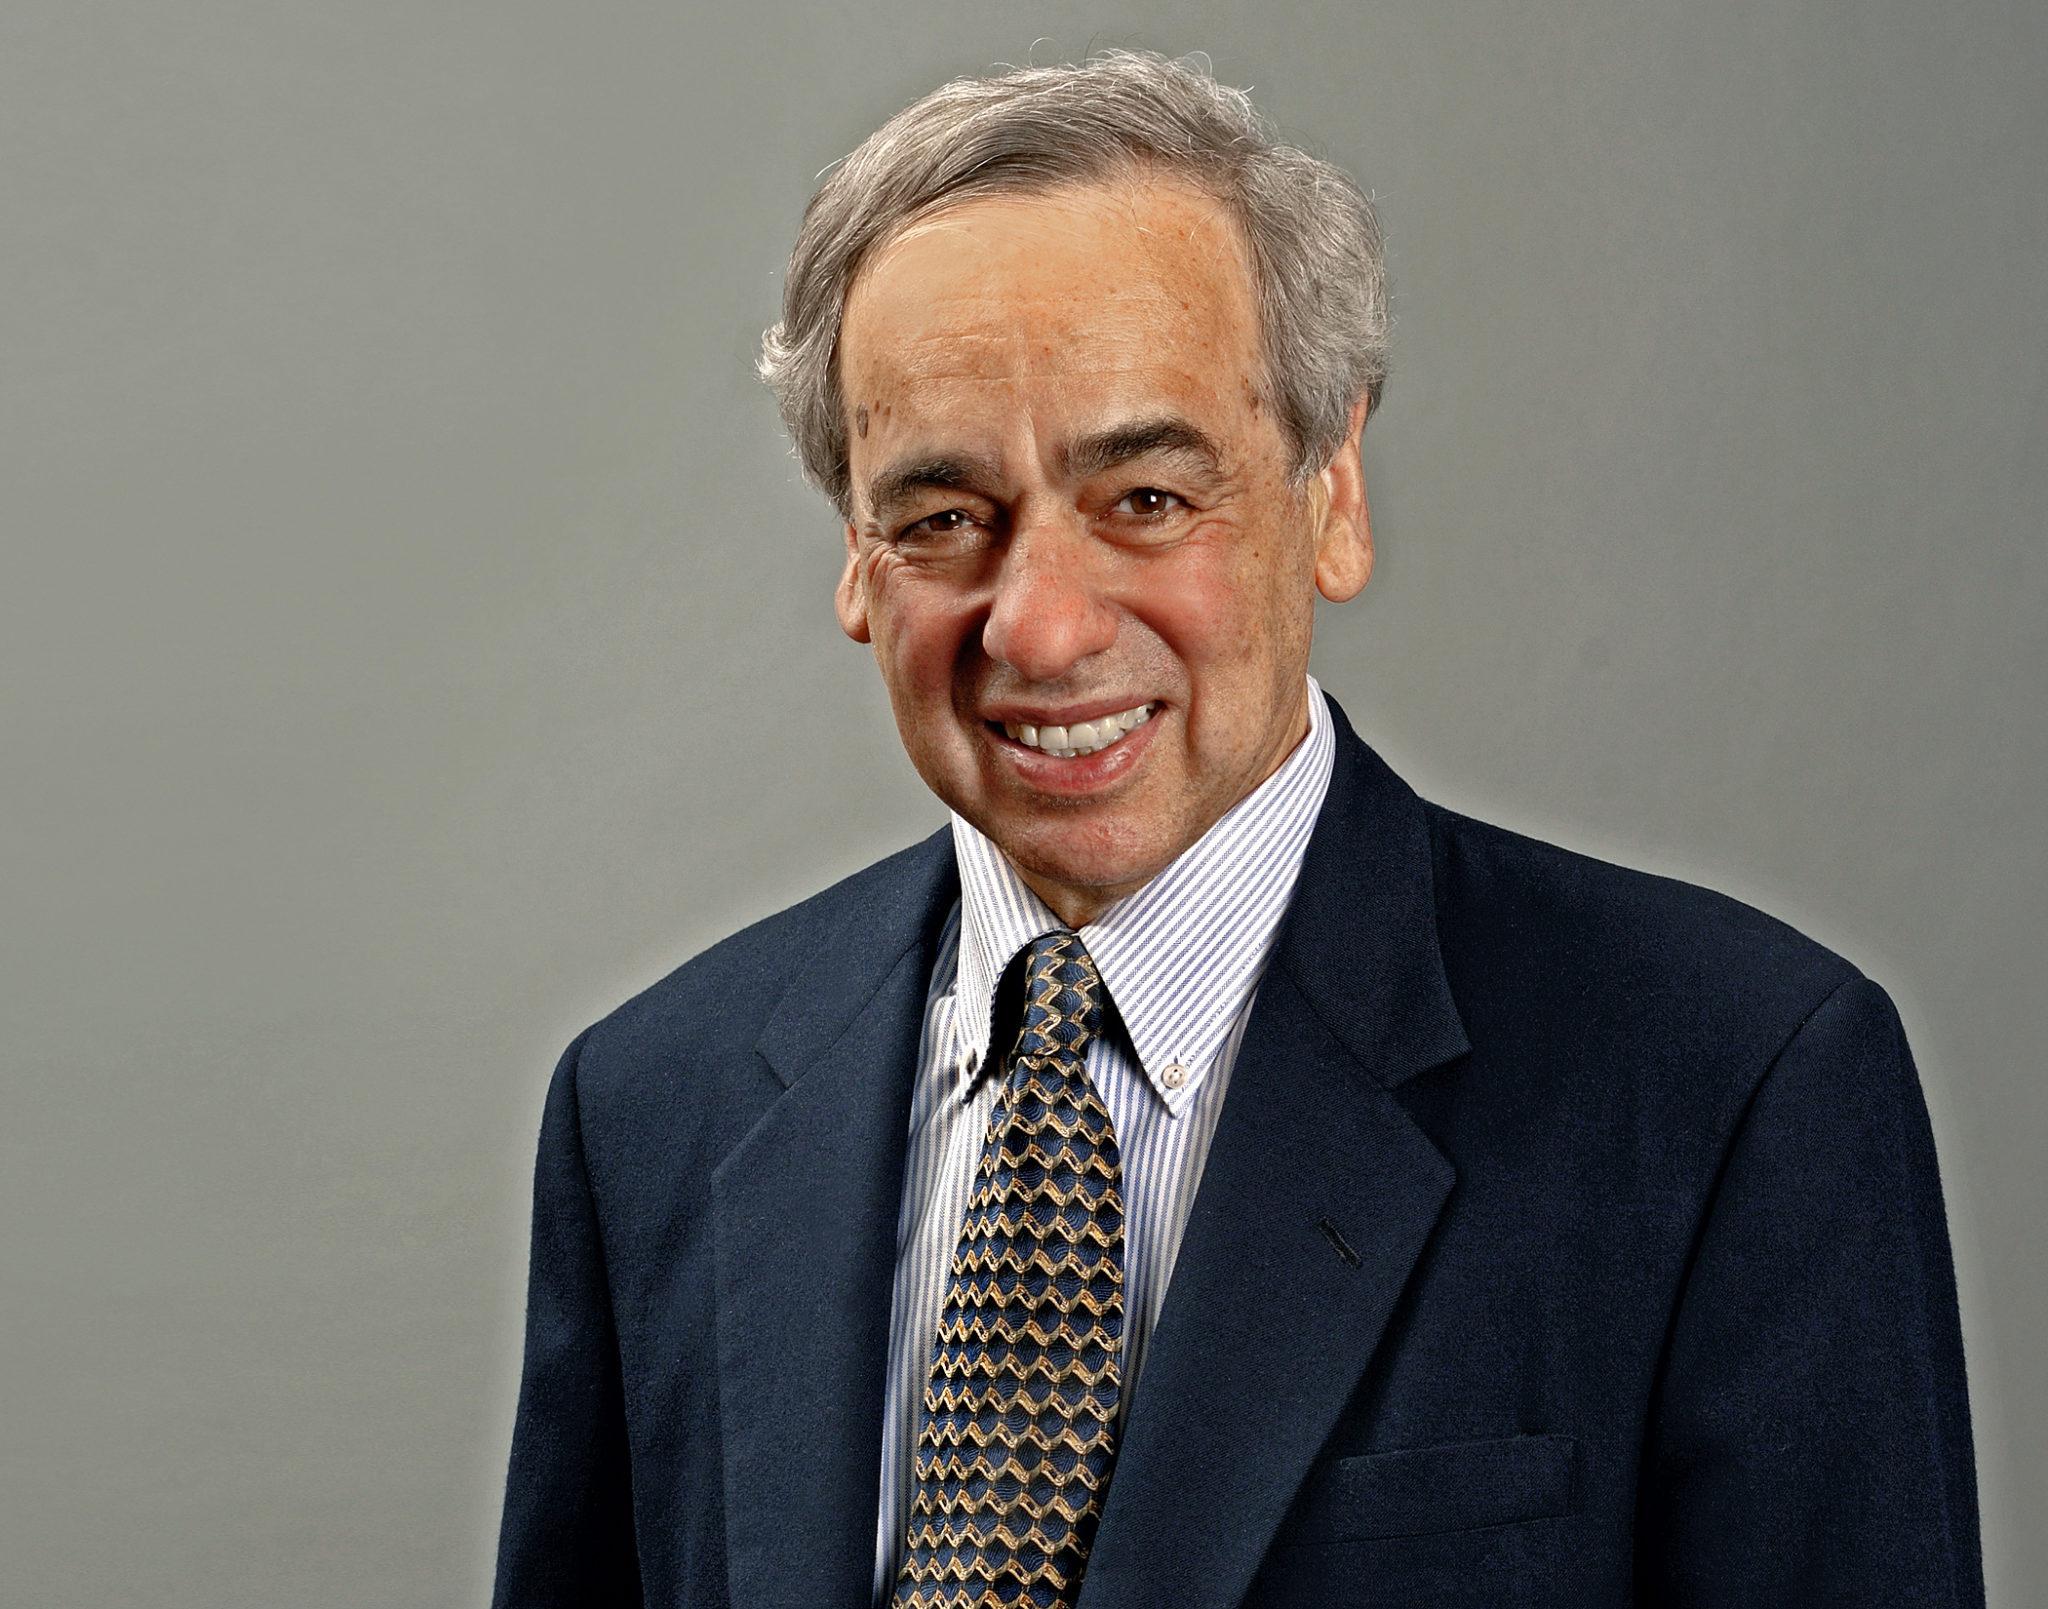 Howard C. Kunreuther